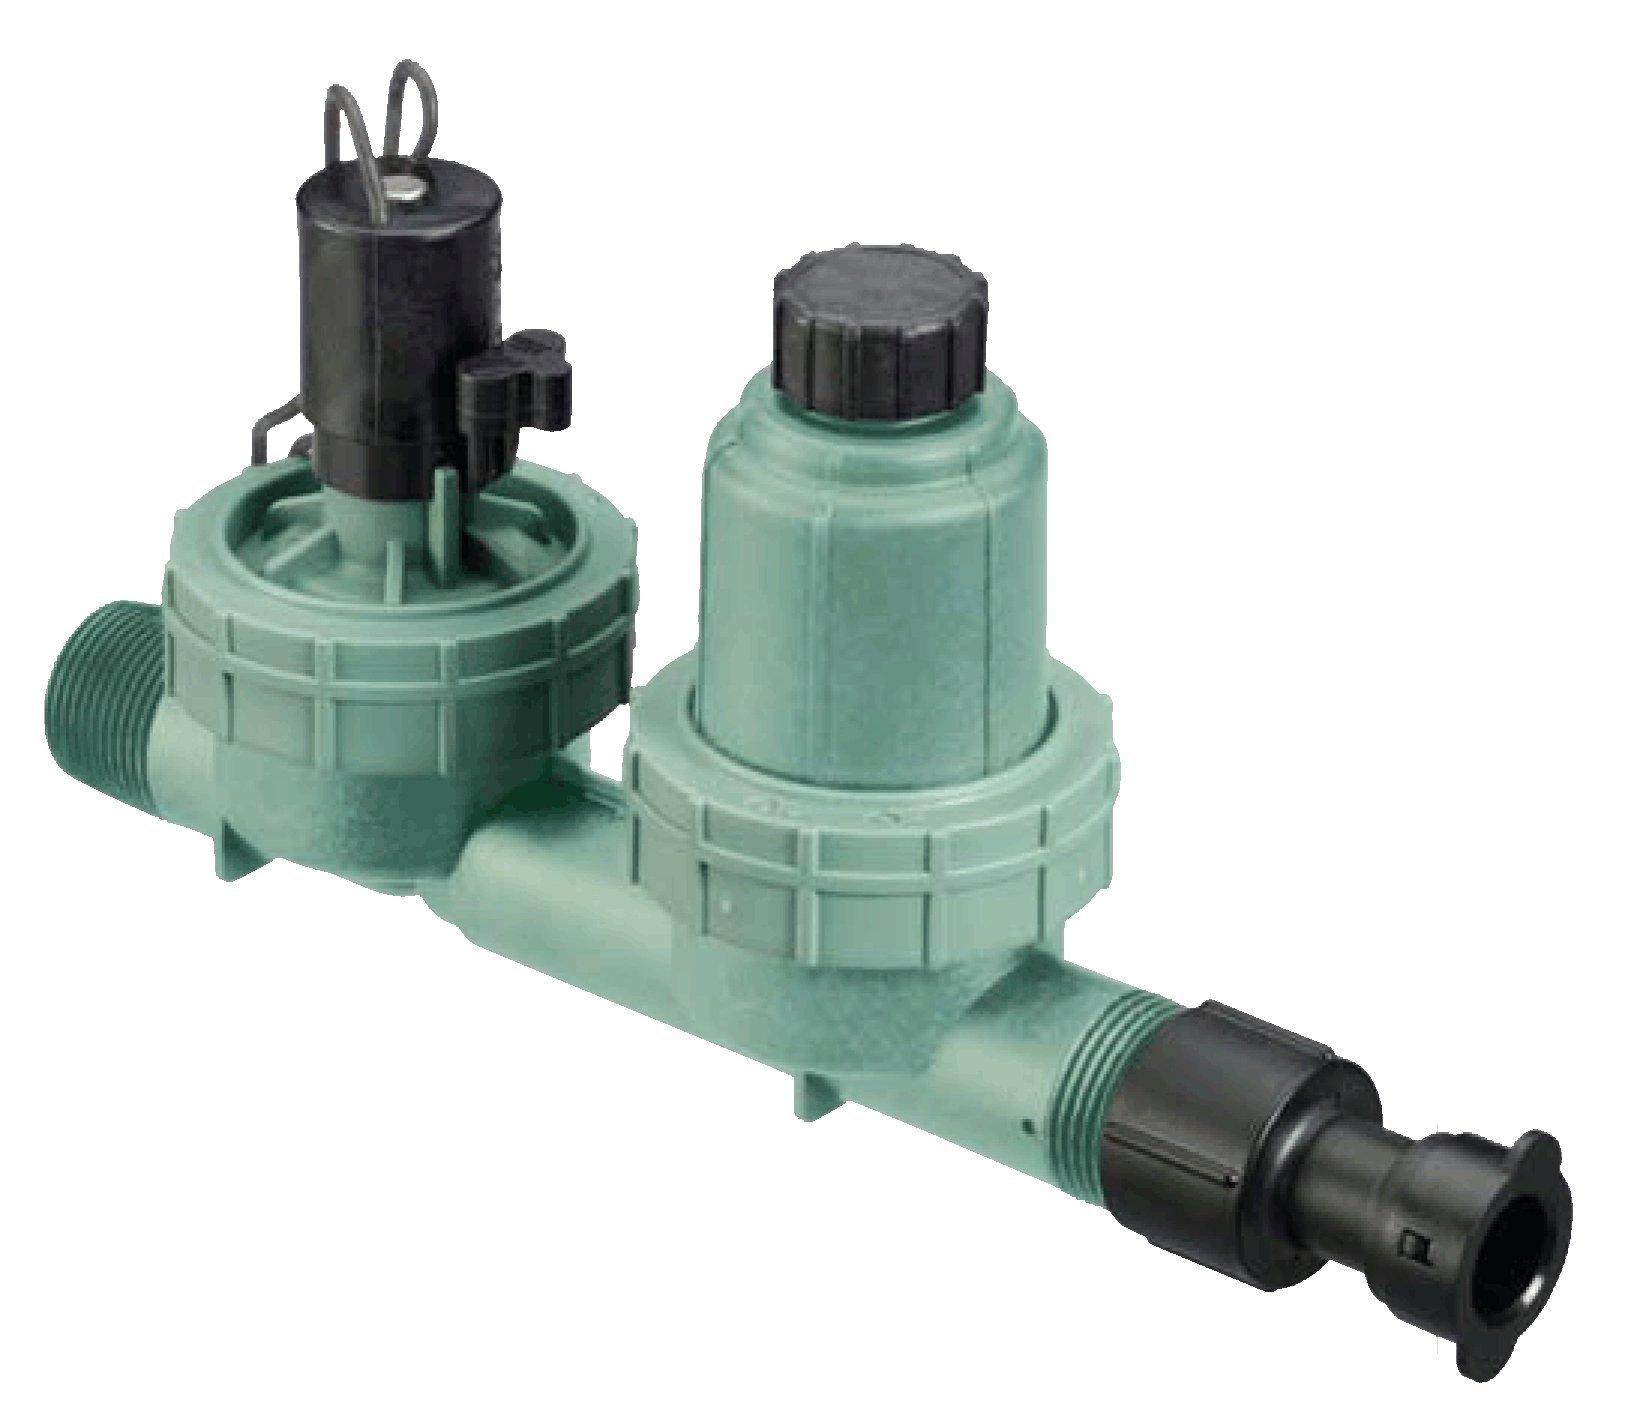 20 Pack - Orbit 4 in 1 Drip Irrigation Valve, Water Filter, Pressure Regulator & Tubing Adaptor - 67790